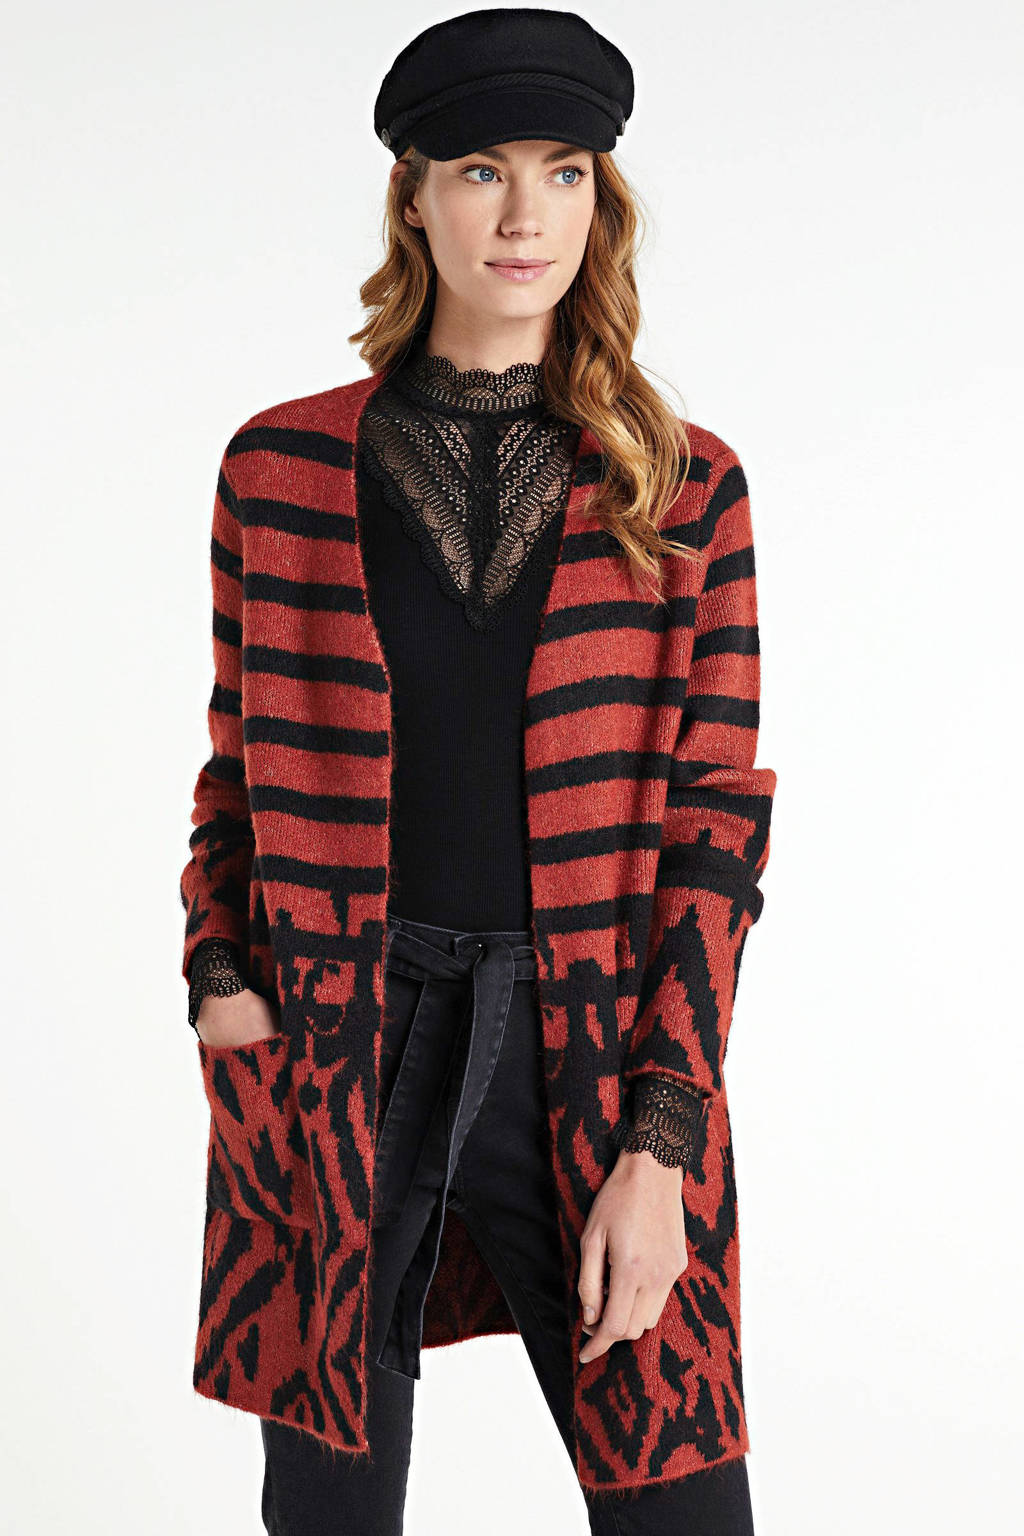 ONLY gebreid vest Flynn met all over print rood/zwart, Rood/zwart